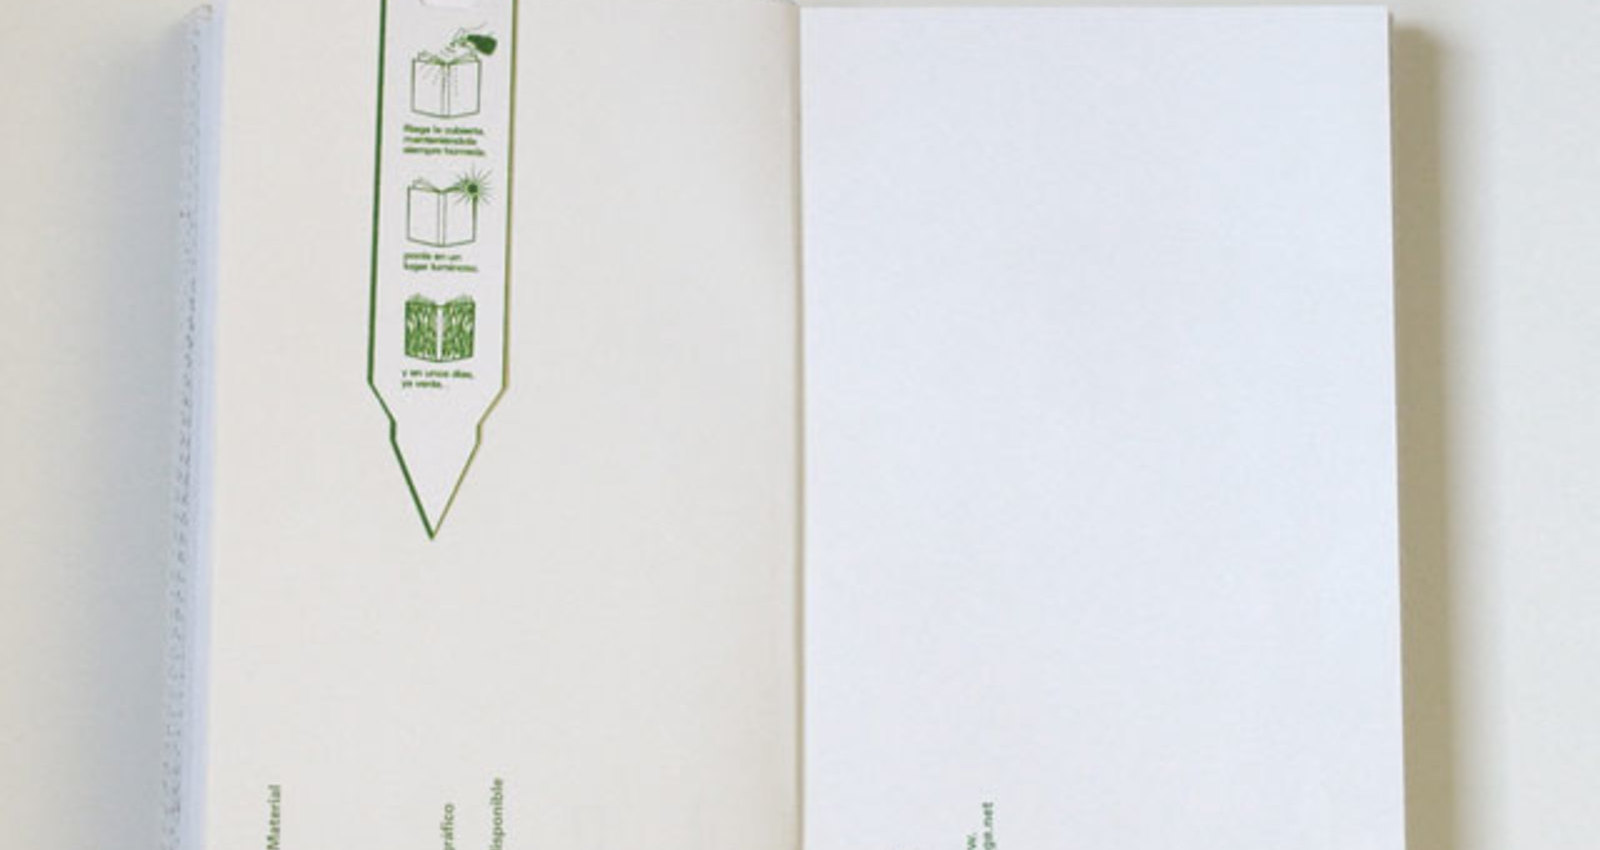 THE JUNGLE BOOK 2/ PRESS BOOK